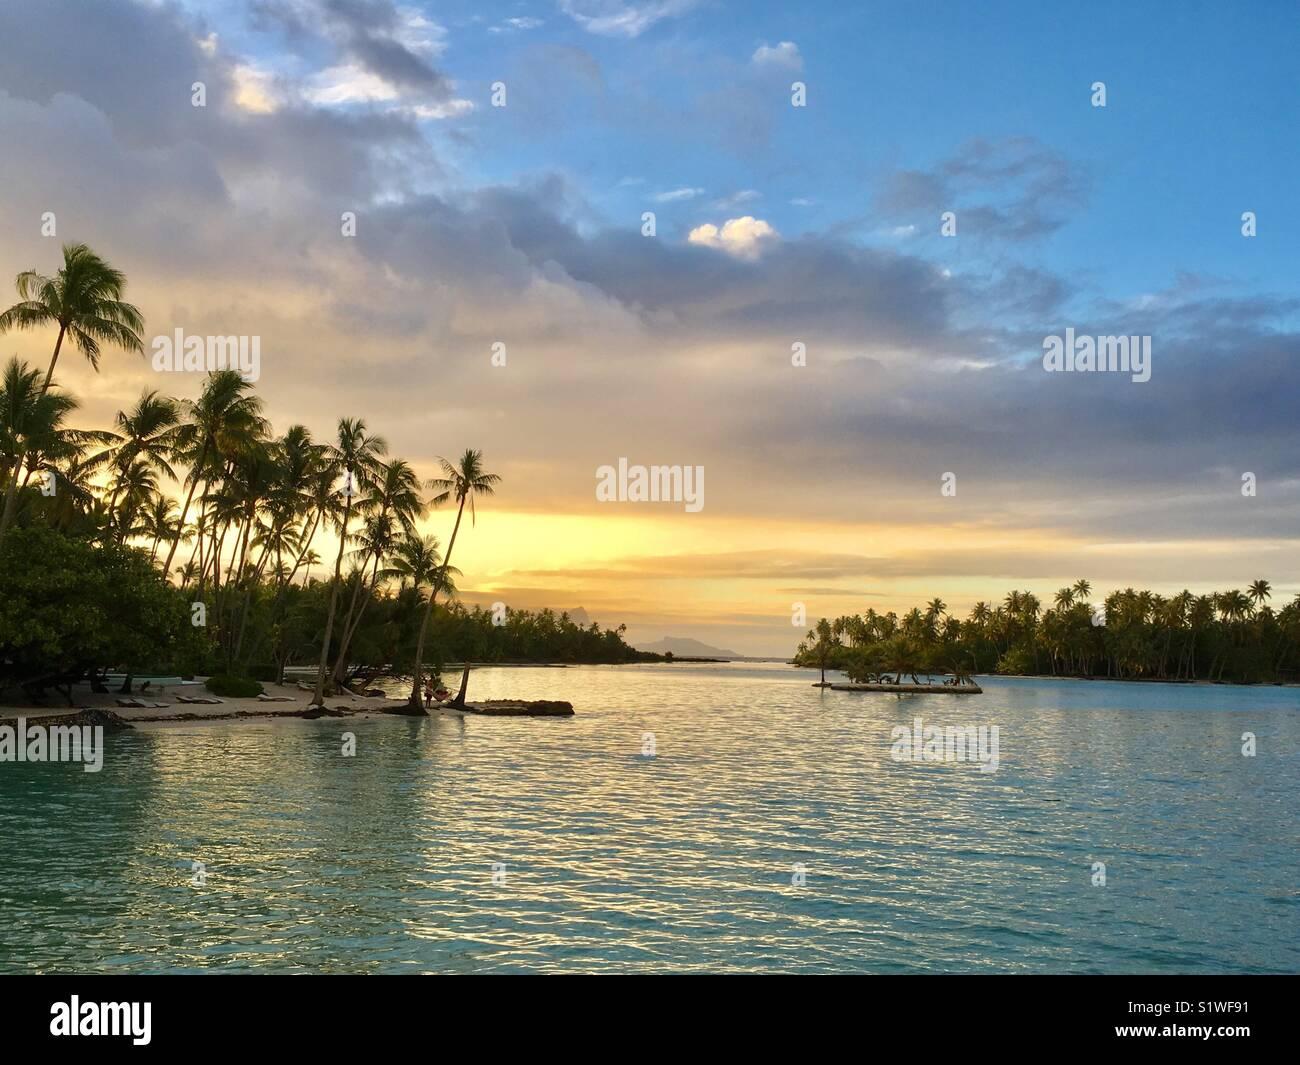 Sunset Taha'a over Bora Bora, French Polynesia - Stock Image